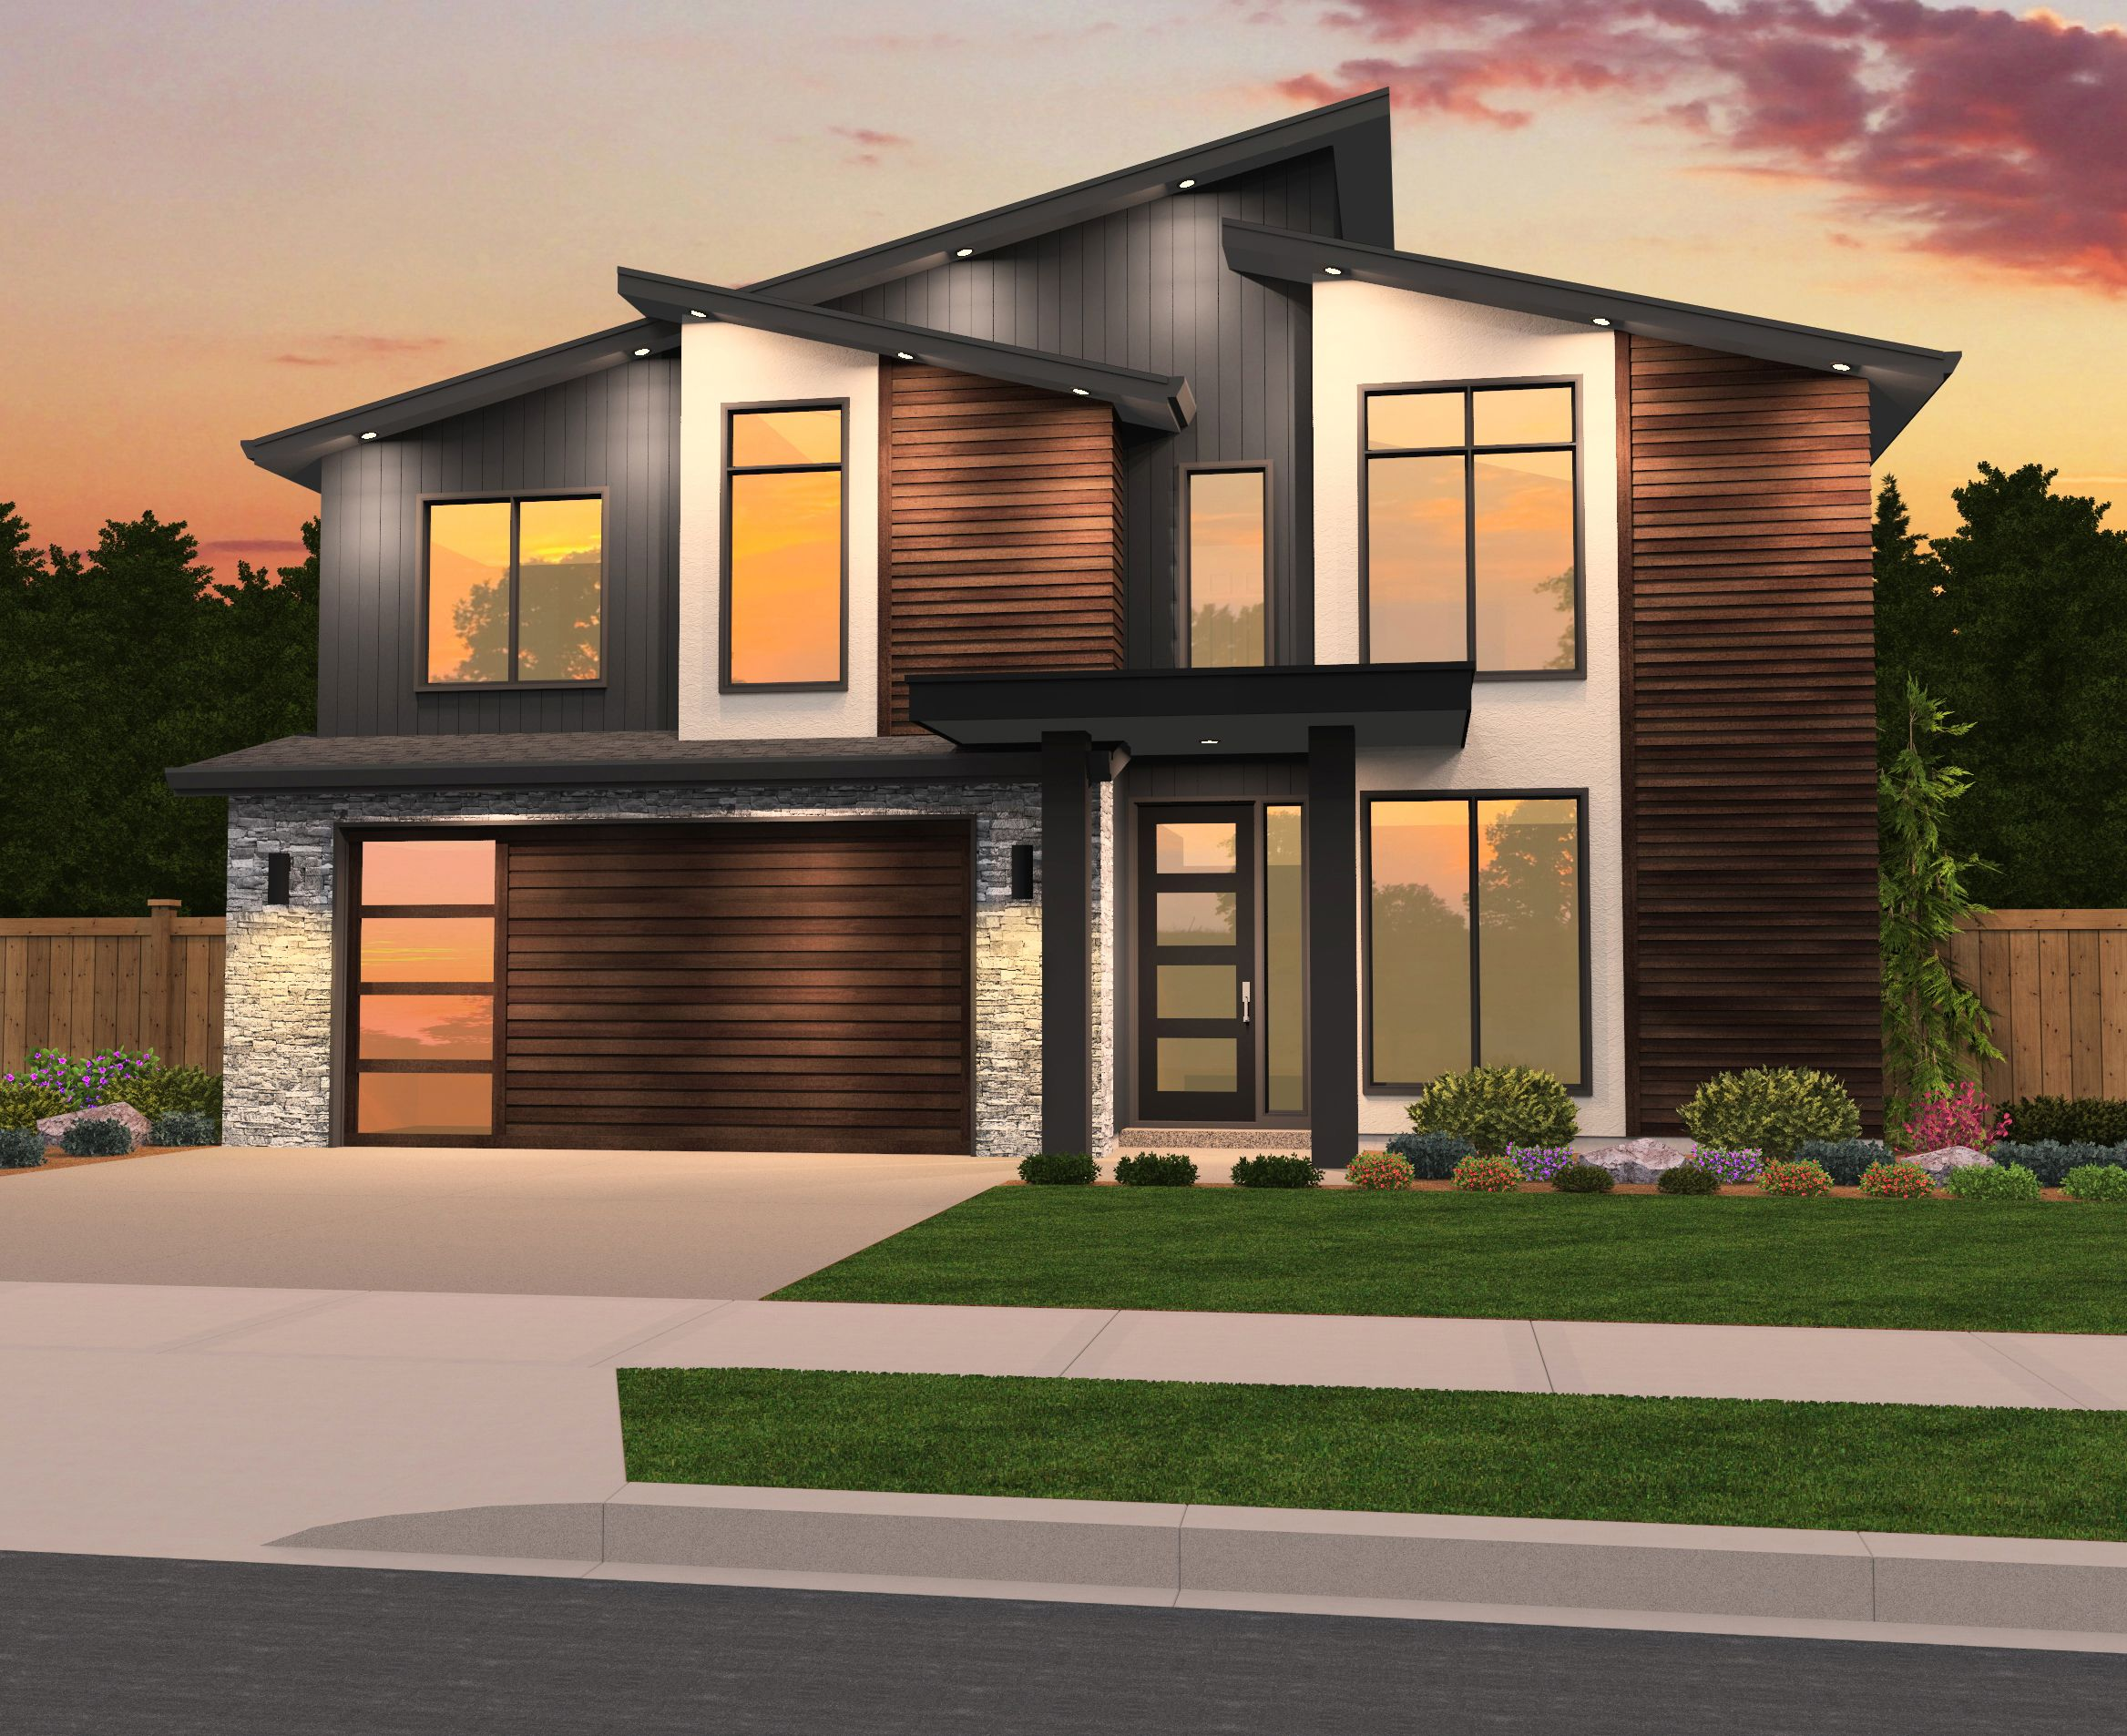 Modern Home Plans Are Mainstream Contemporary House Exterior Small Modern House Plans Modern House Plans